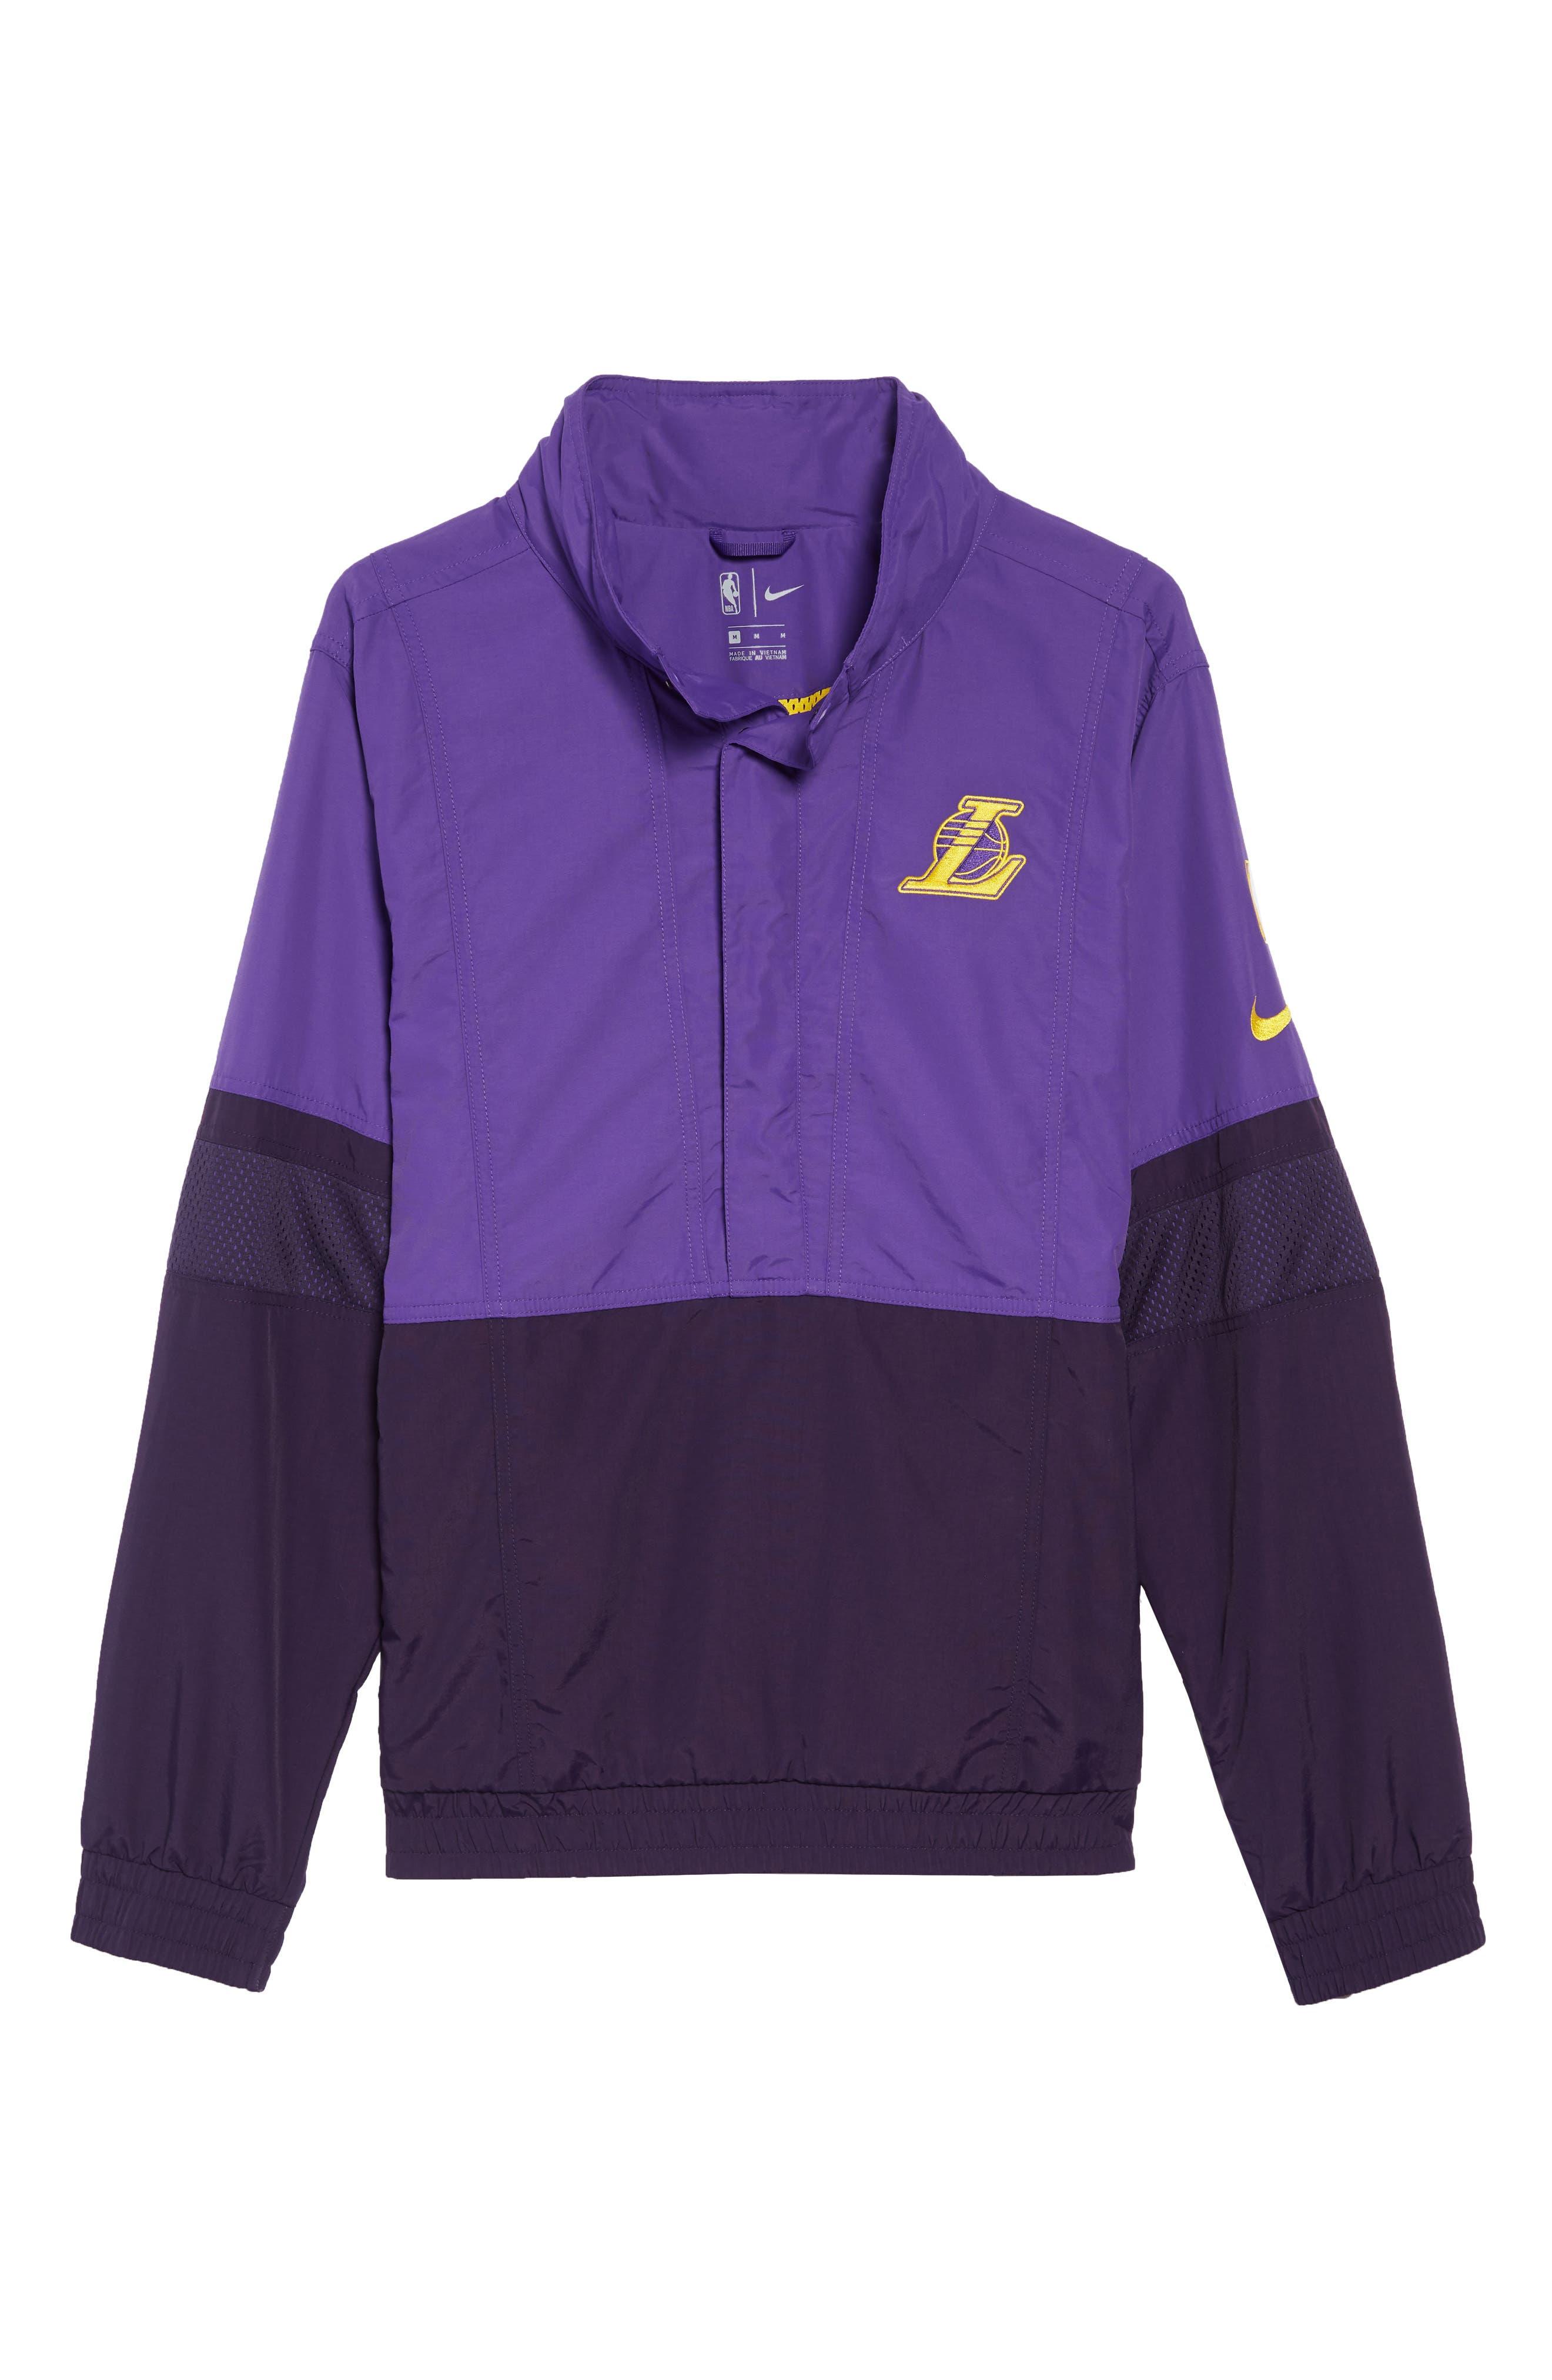 Los Angeles Lakers Courtside Warm-Up Jacket,                             Alternate thumbnail 7, color,                             FIELD PURPLE/PURPLE/ AMARILLO